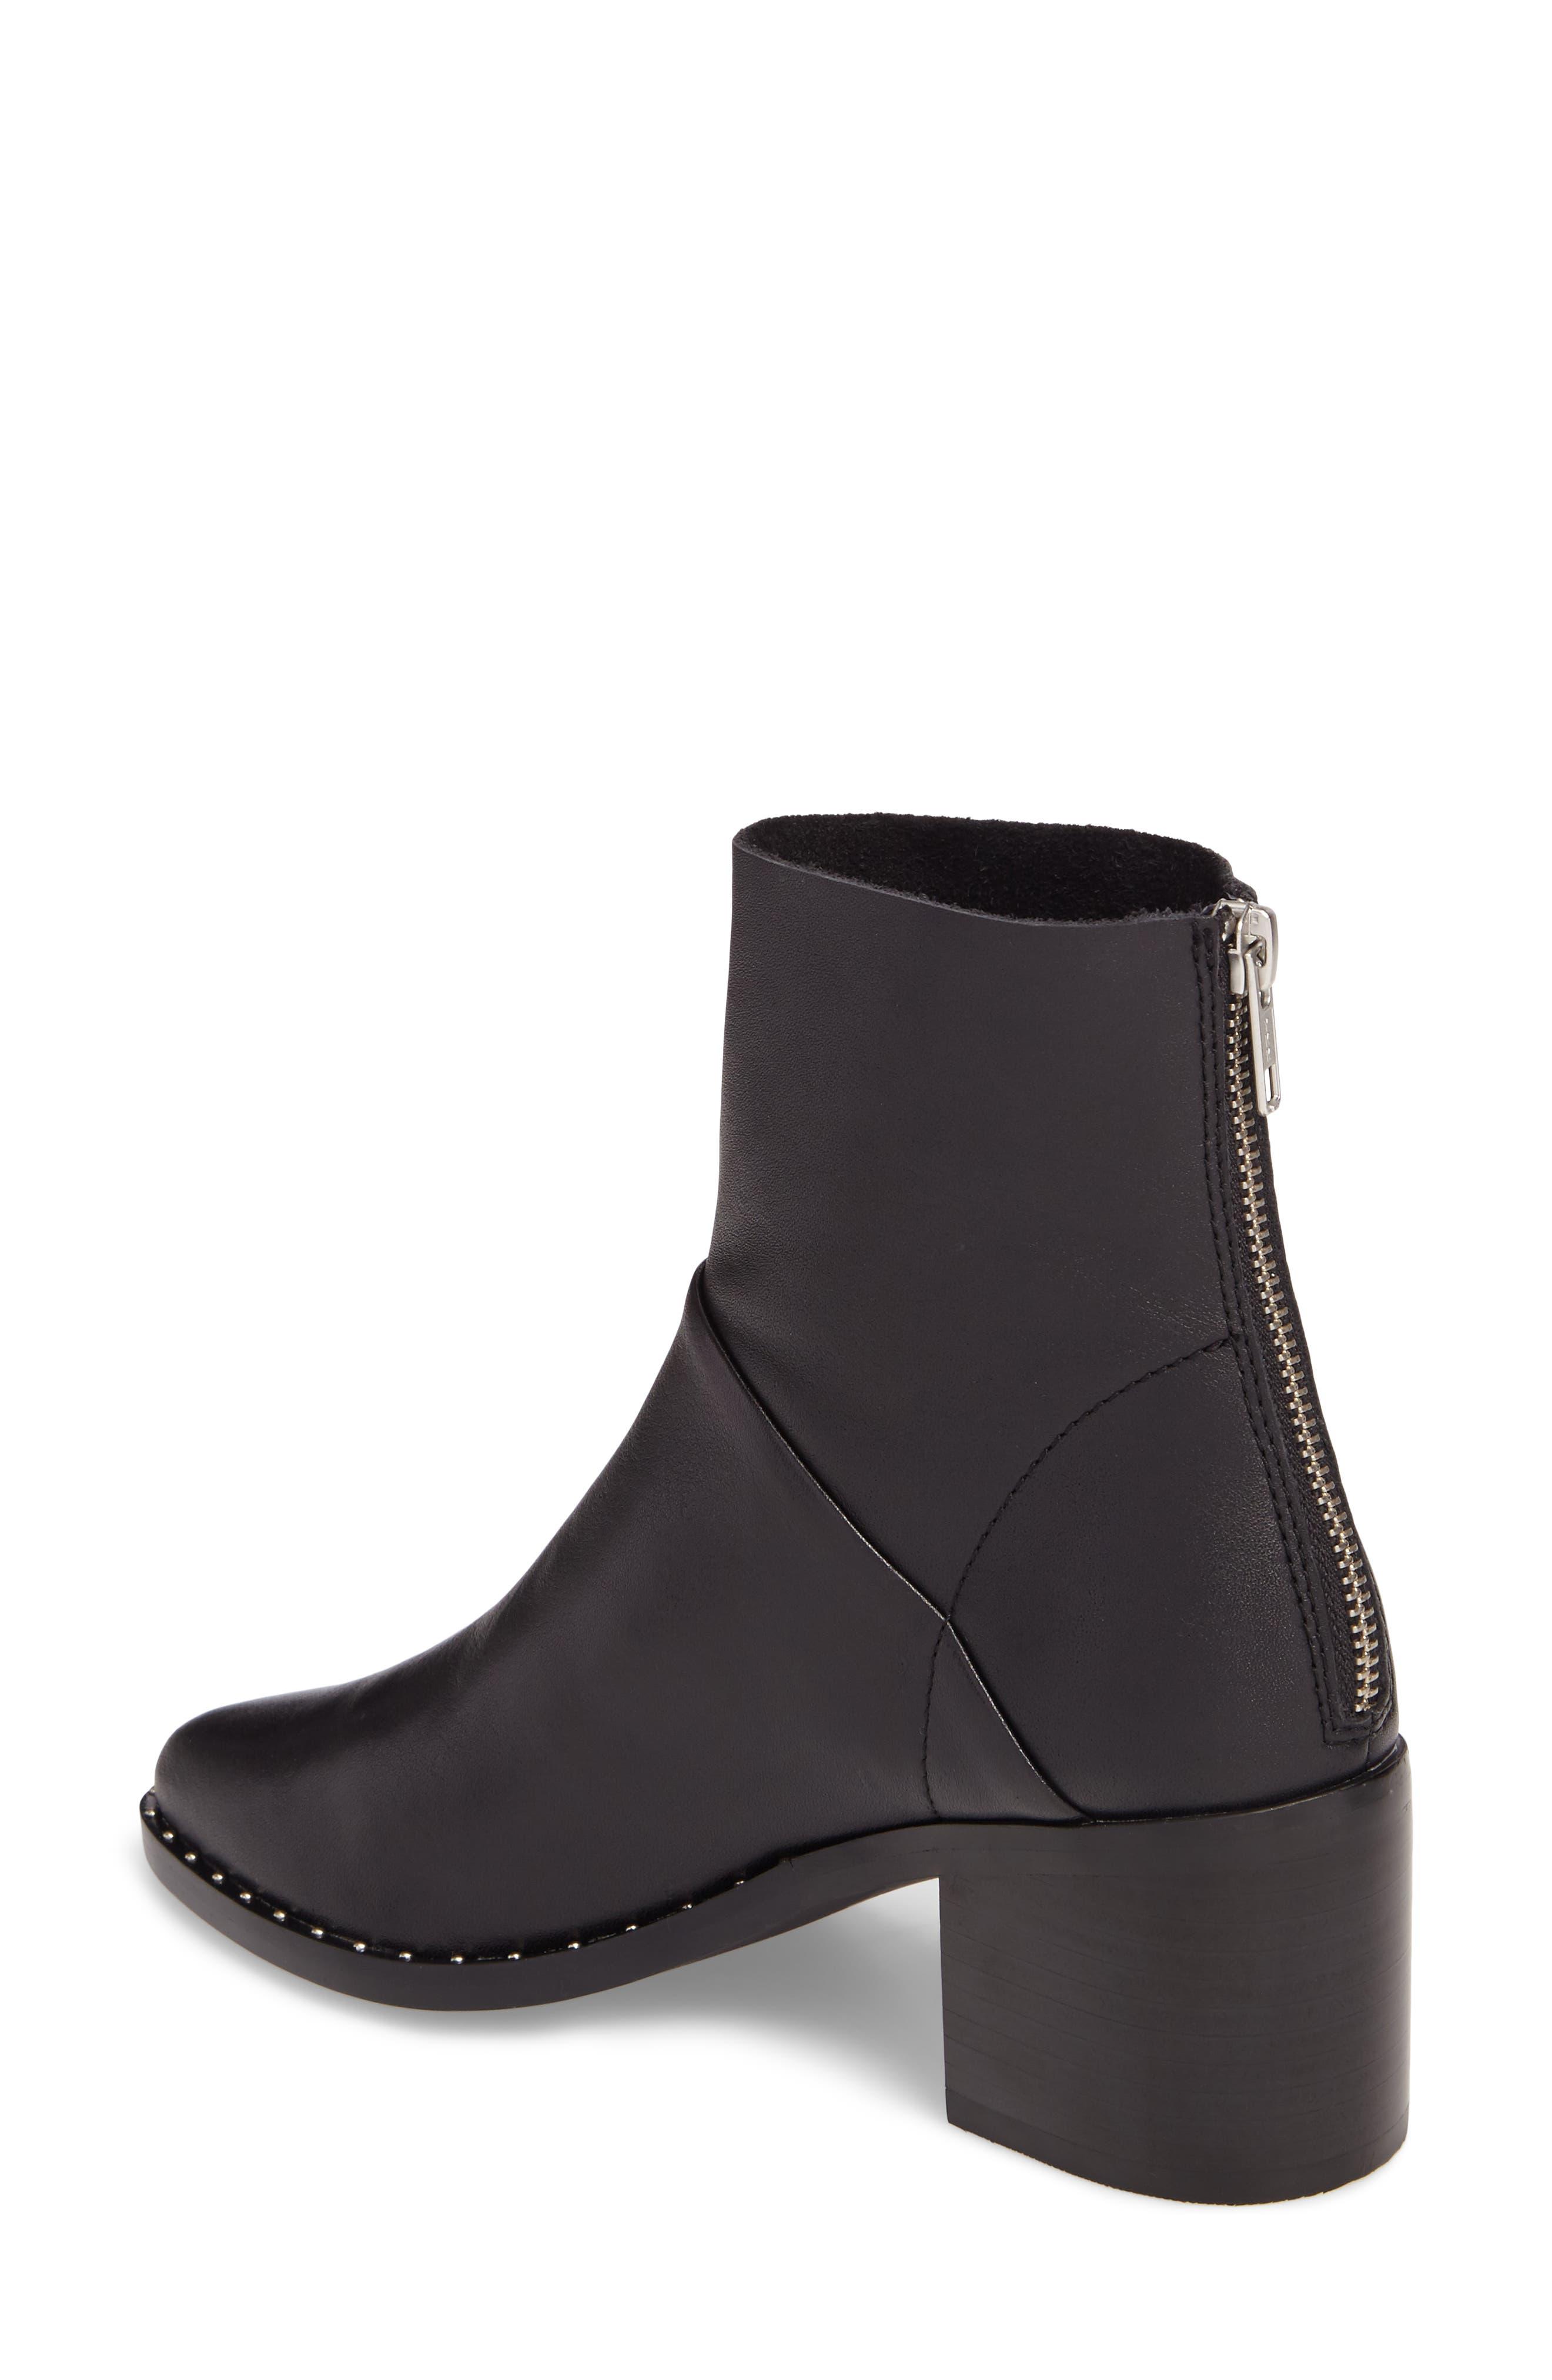 0d53a4b21e3 Women s Treasure   Bond Booties   Ankle Boots